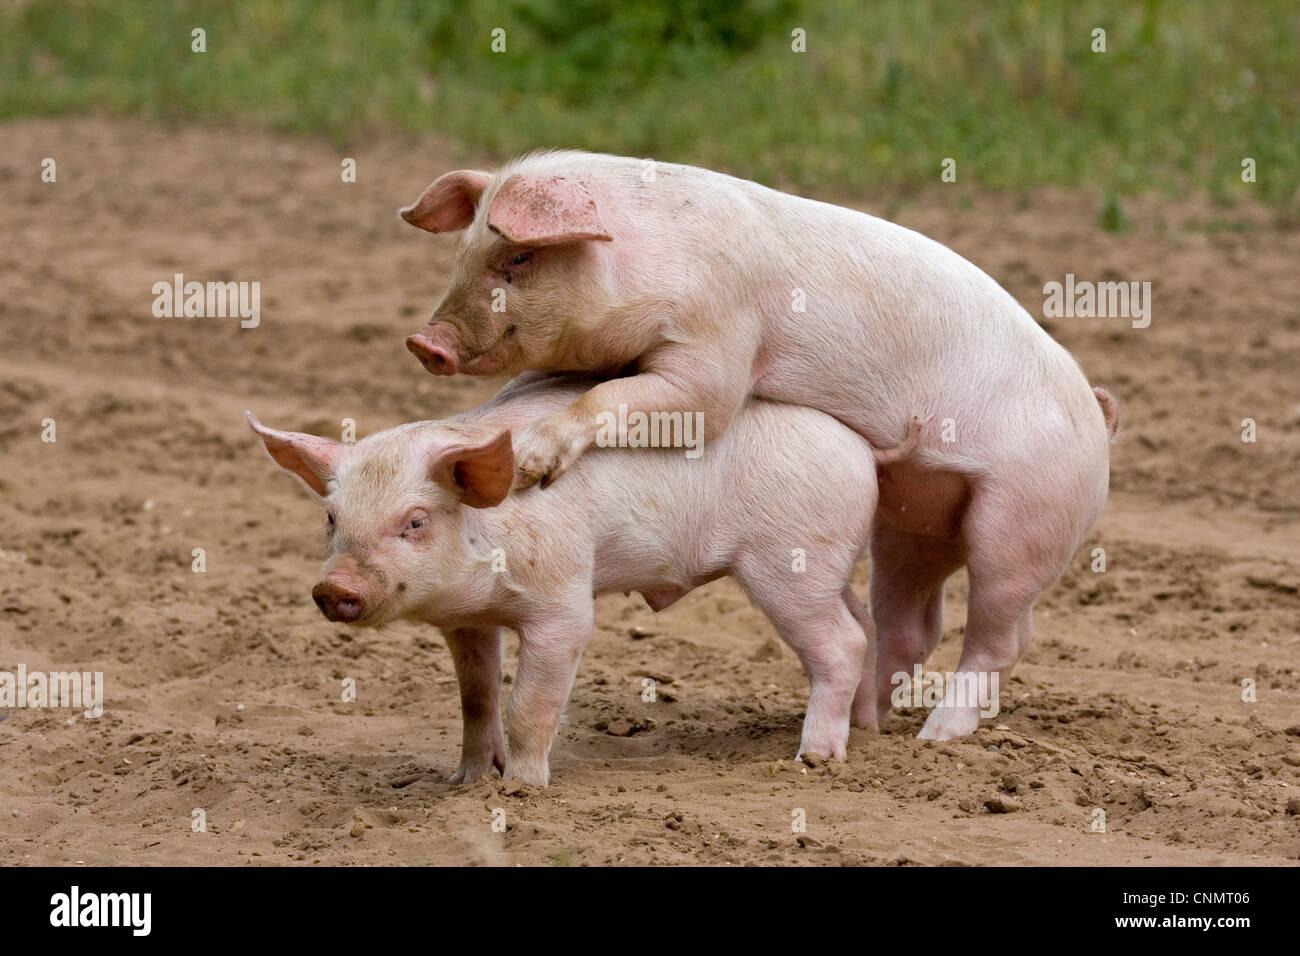 domestic pig large white x landrace x duroc freerange piglets